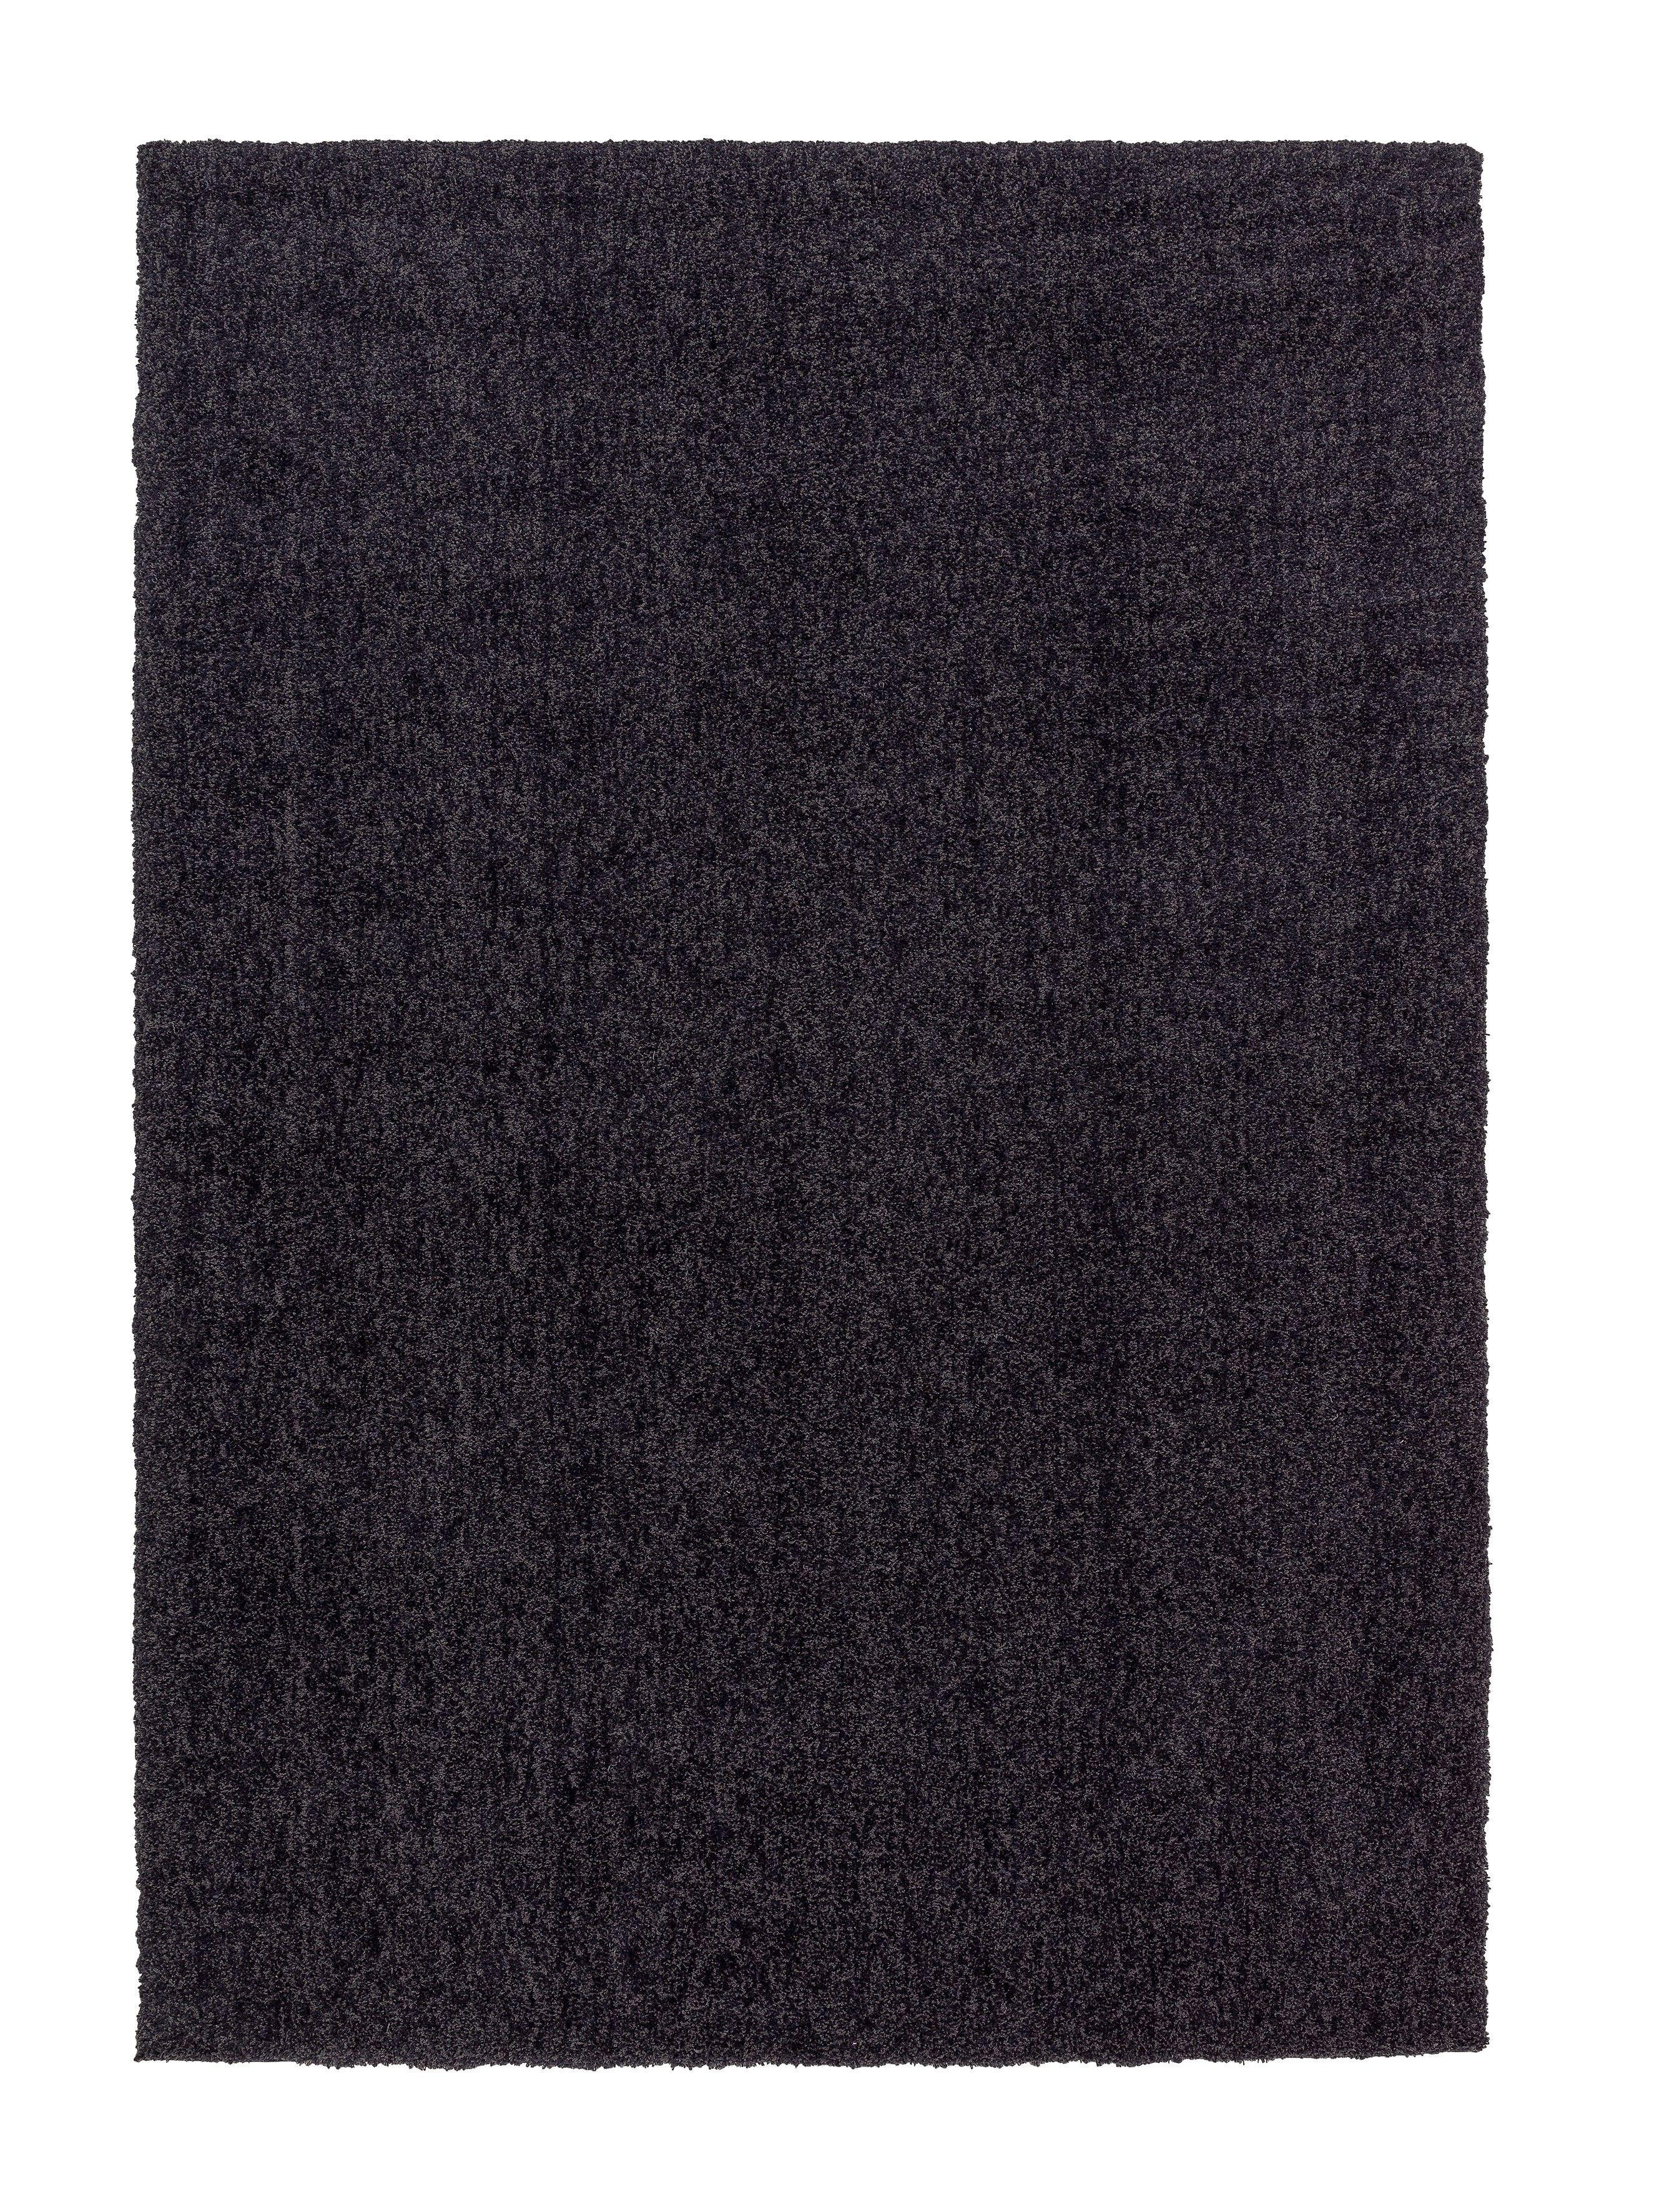 Astra - Golze koberce Kusový koberec Livorno 160041 Mottled Grey - 120x180 cm